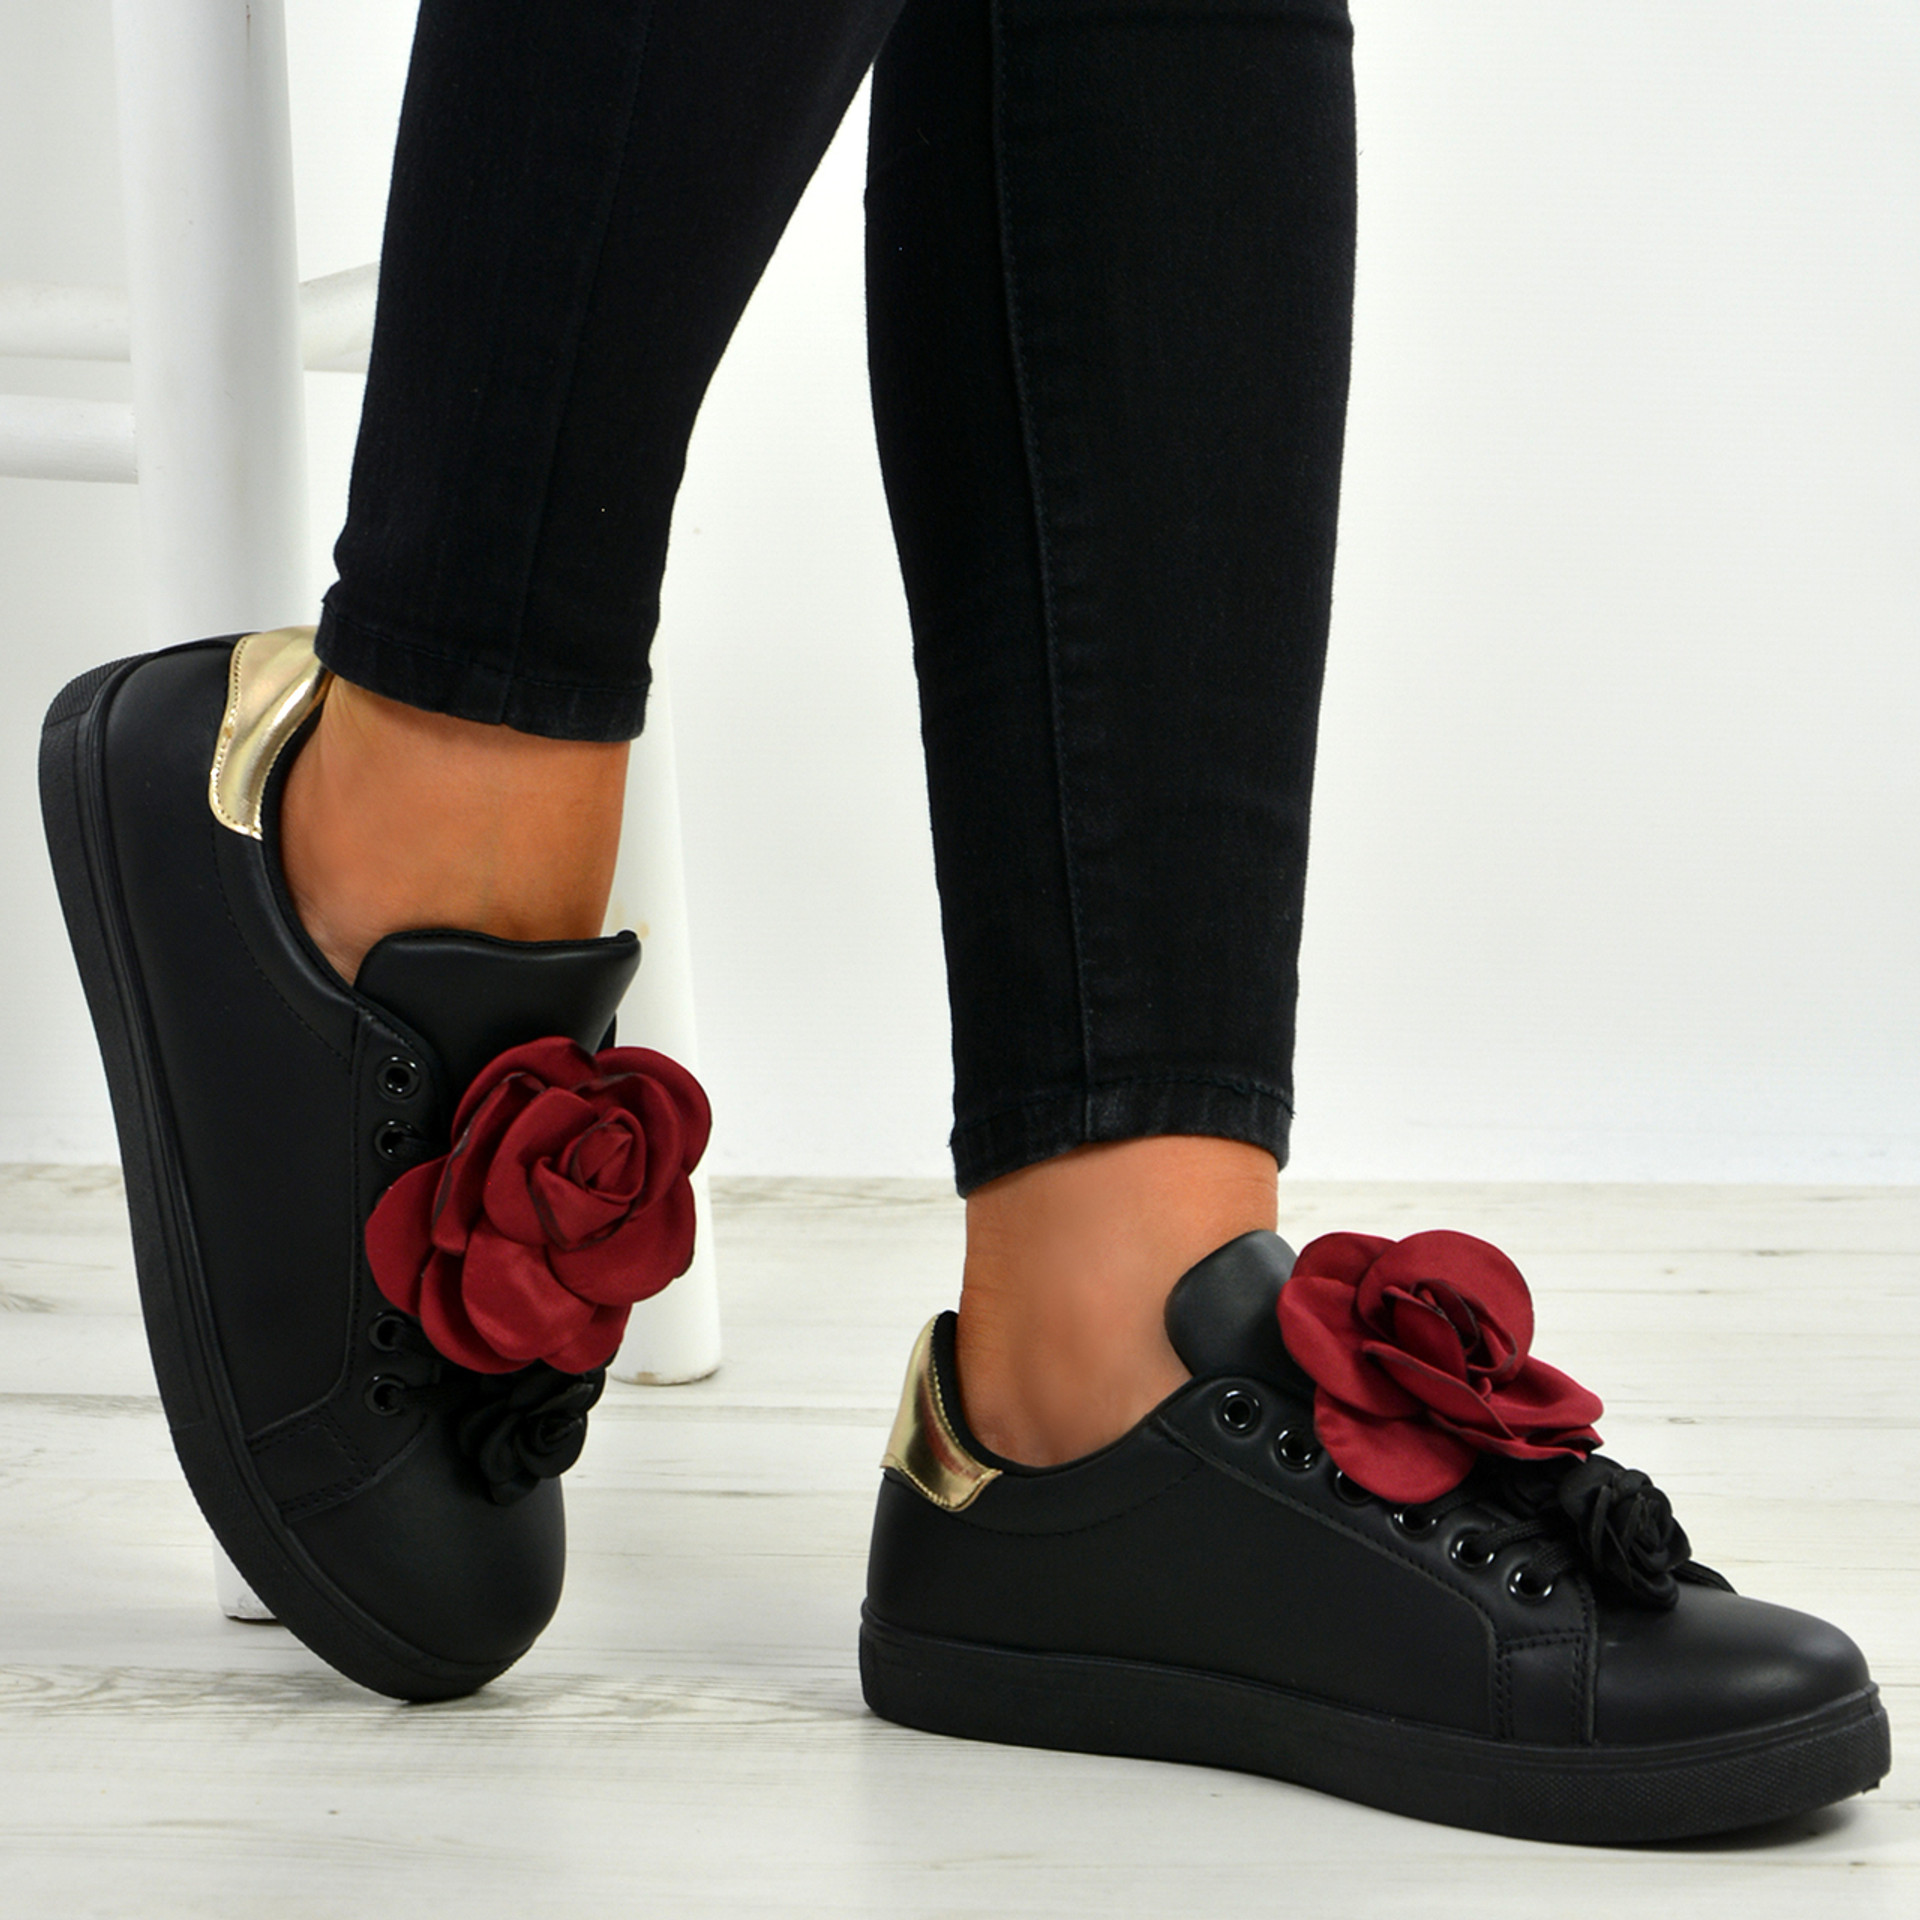 Payten Black Rose Trainers